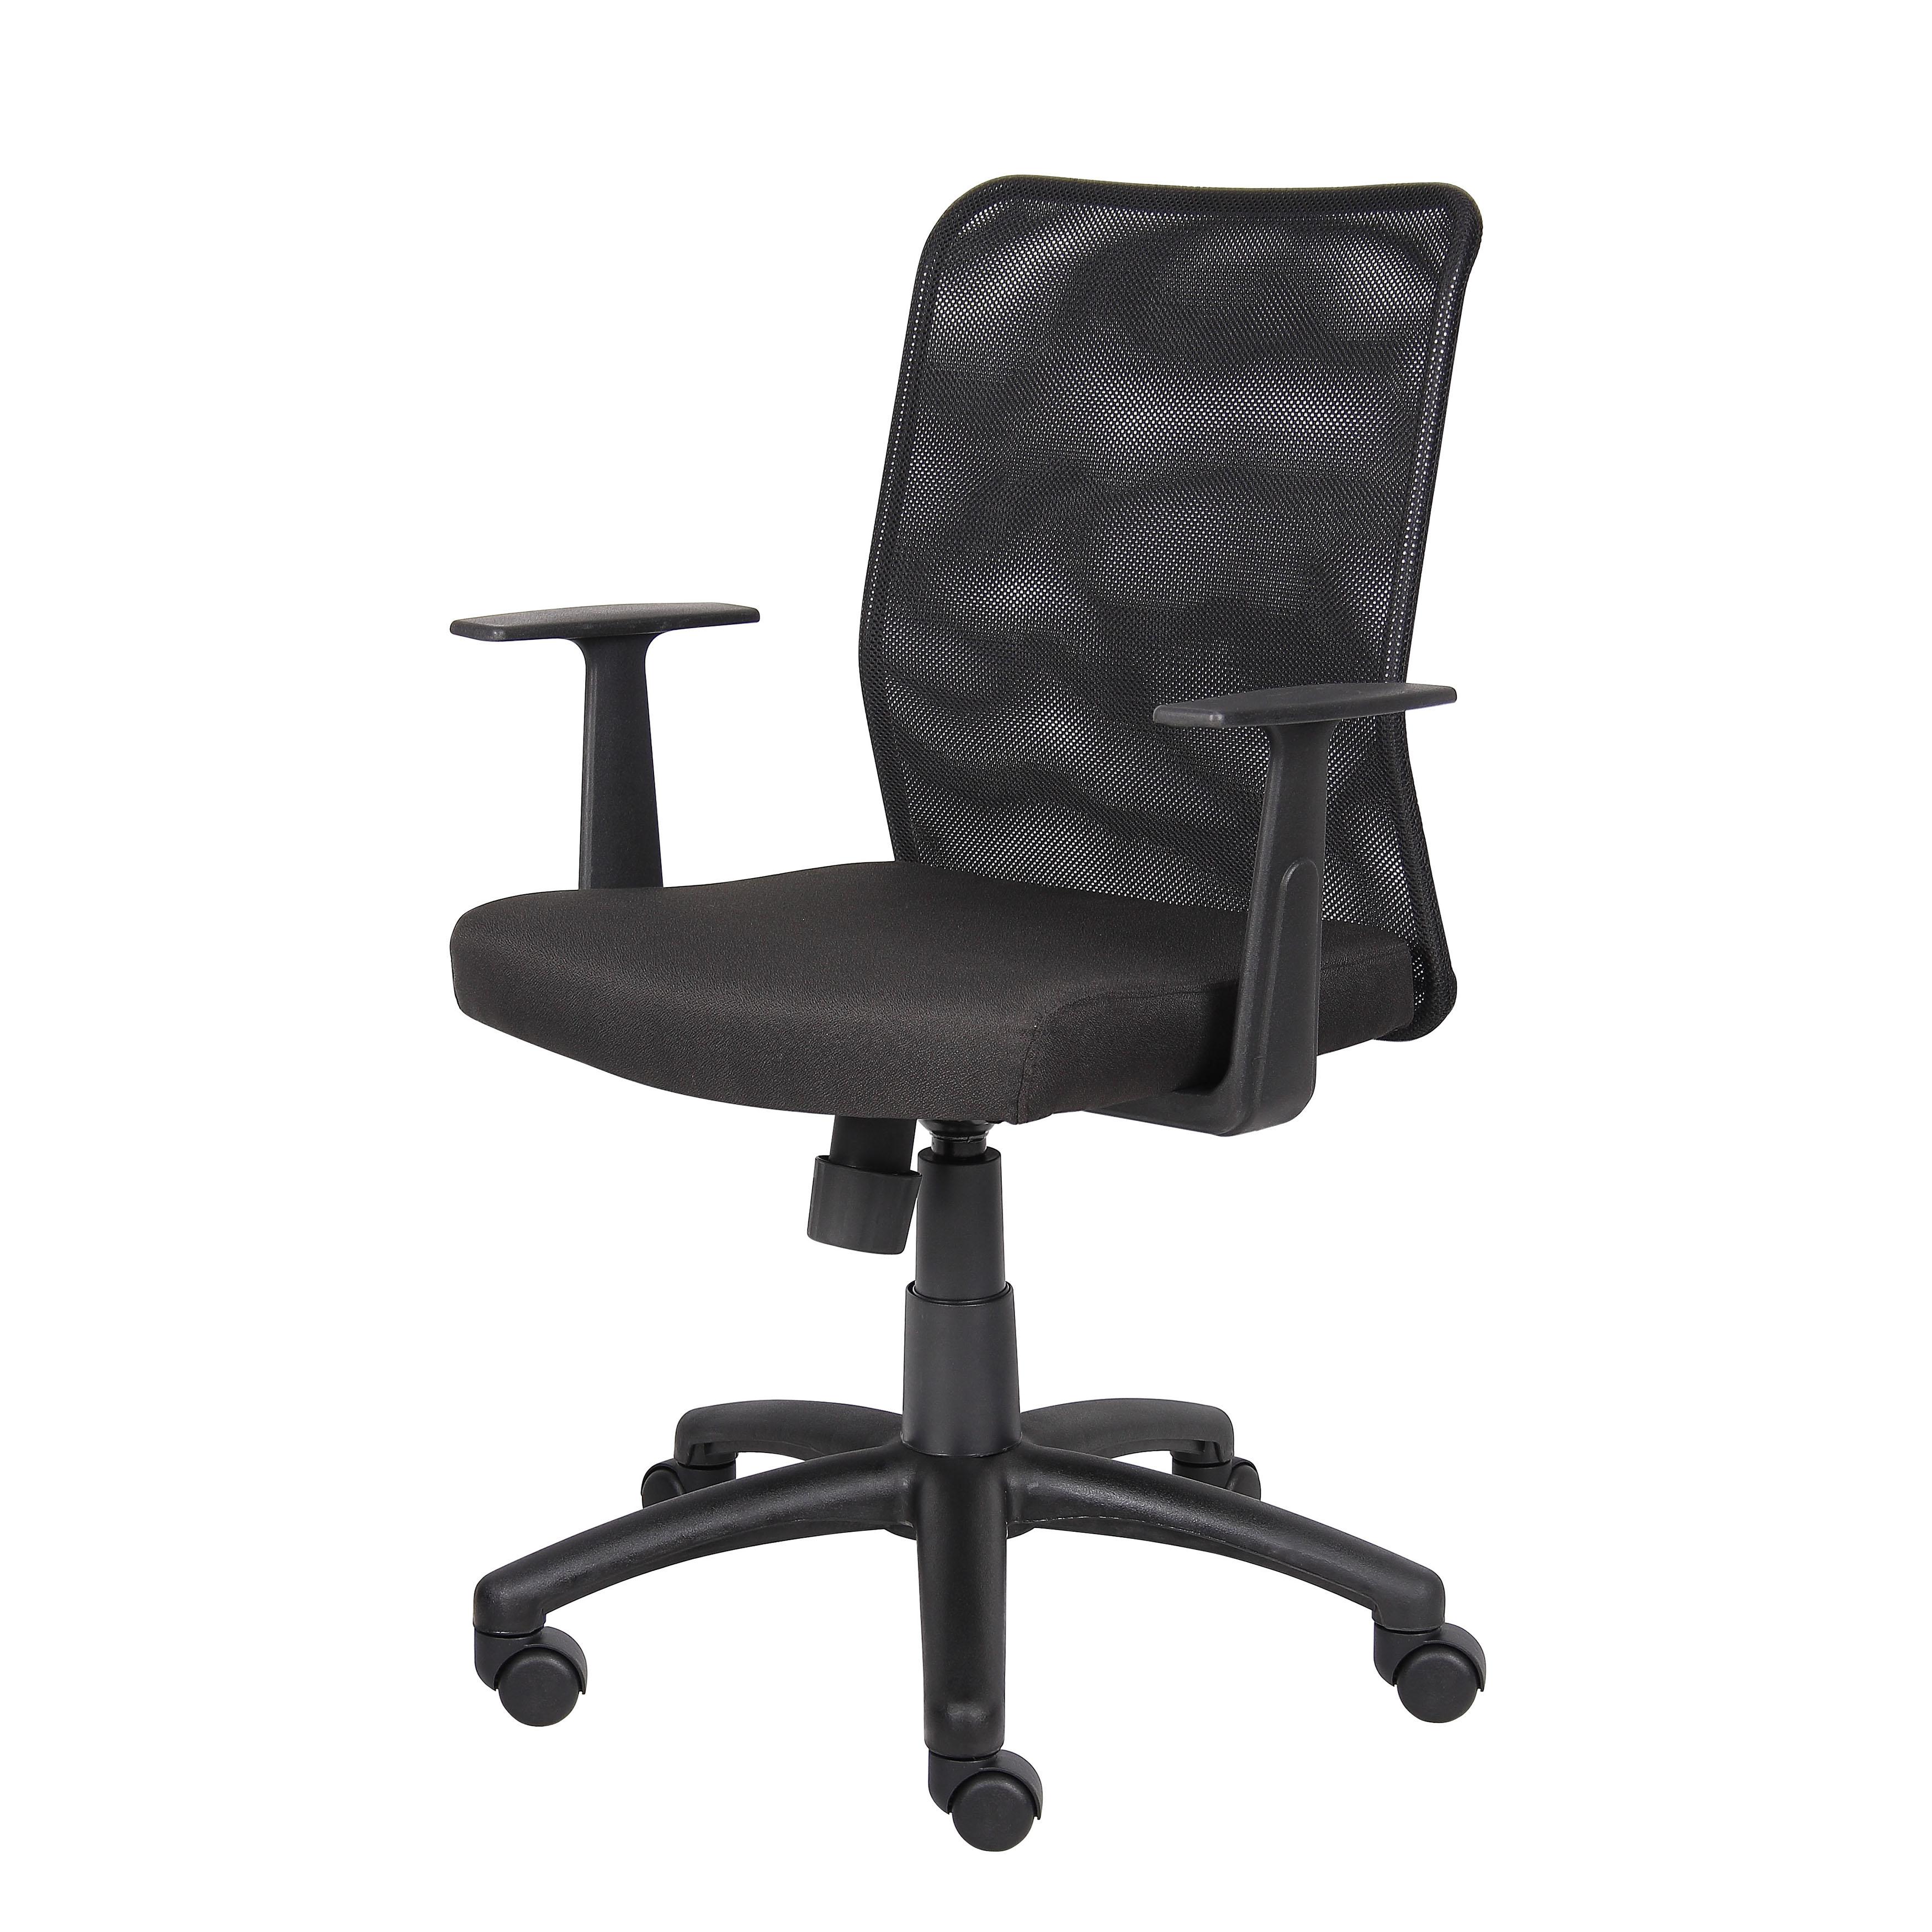 mesh black chair lite office